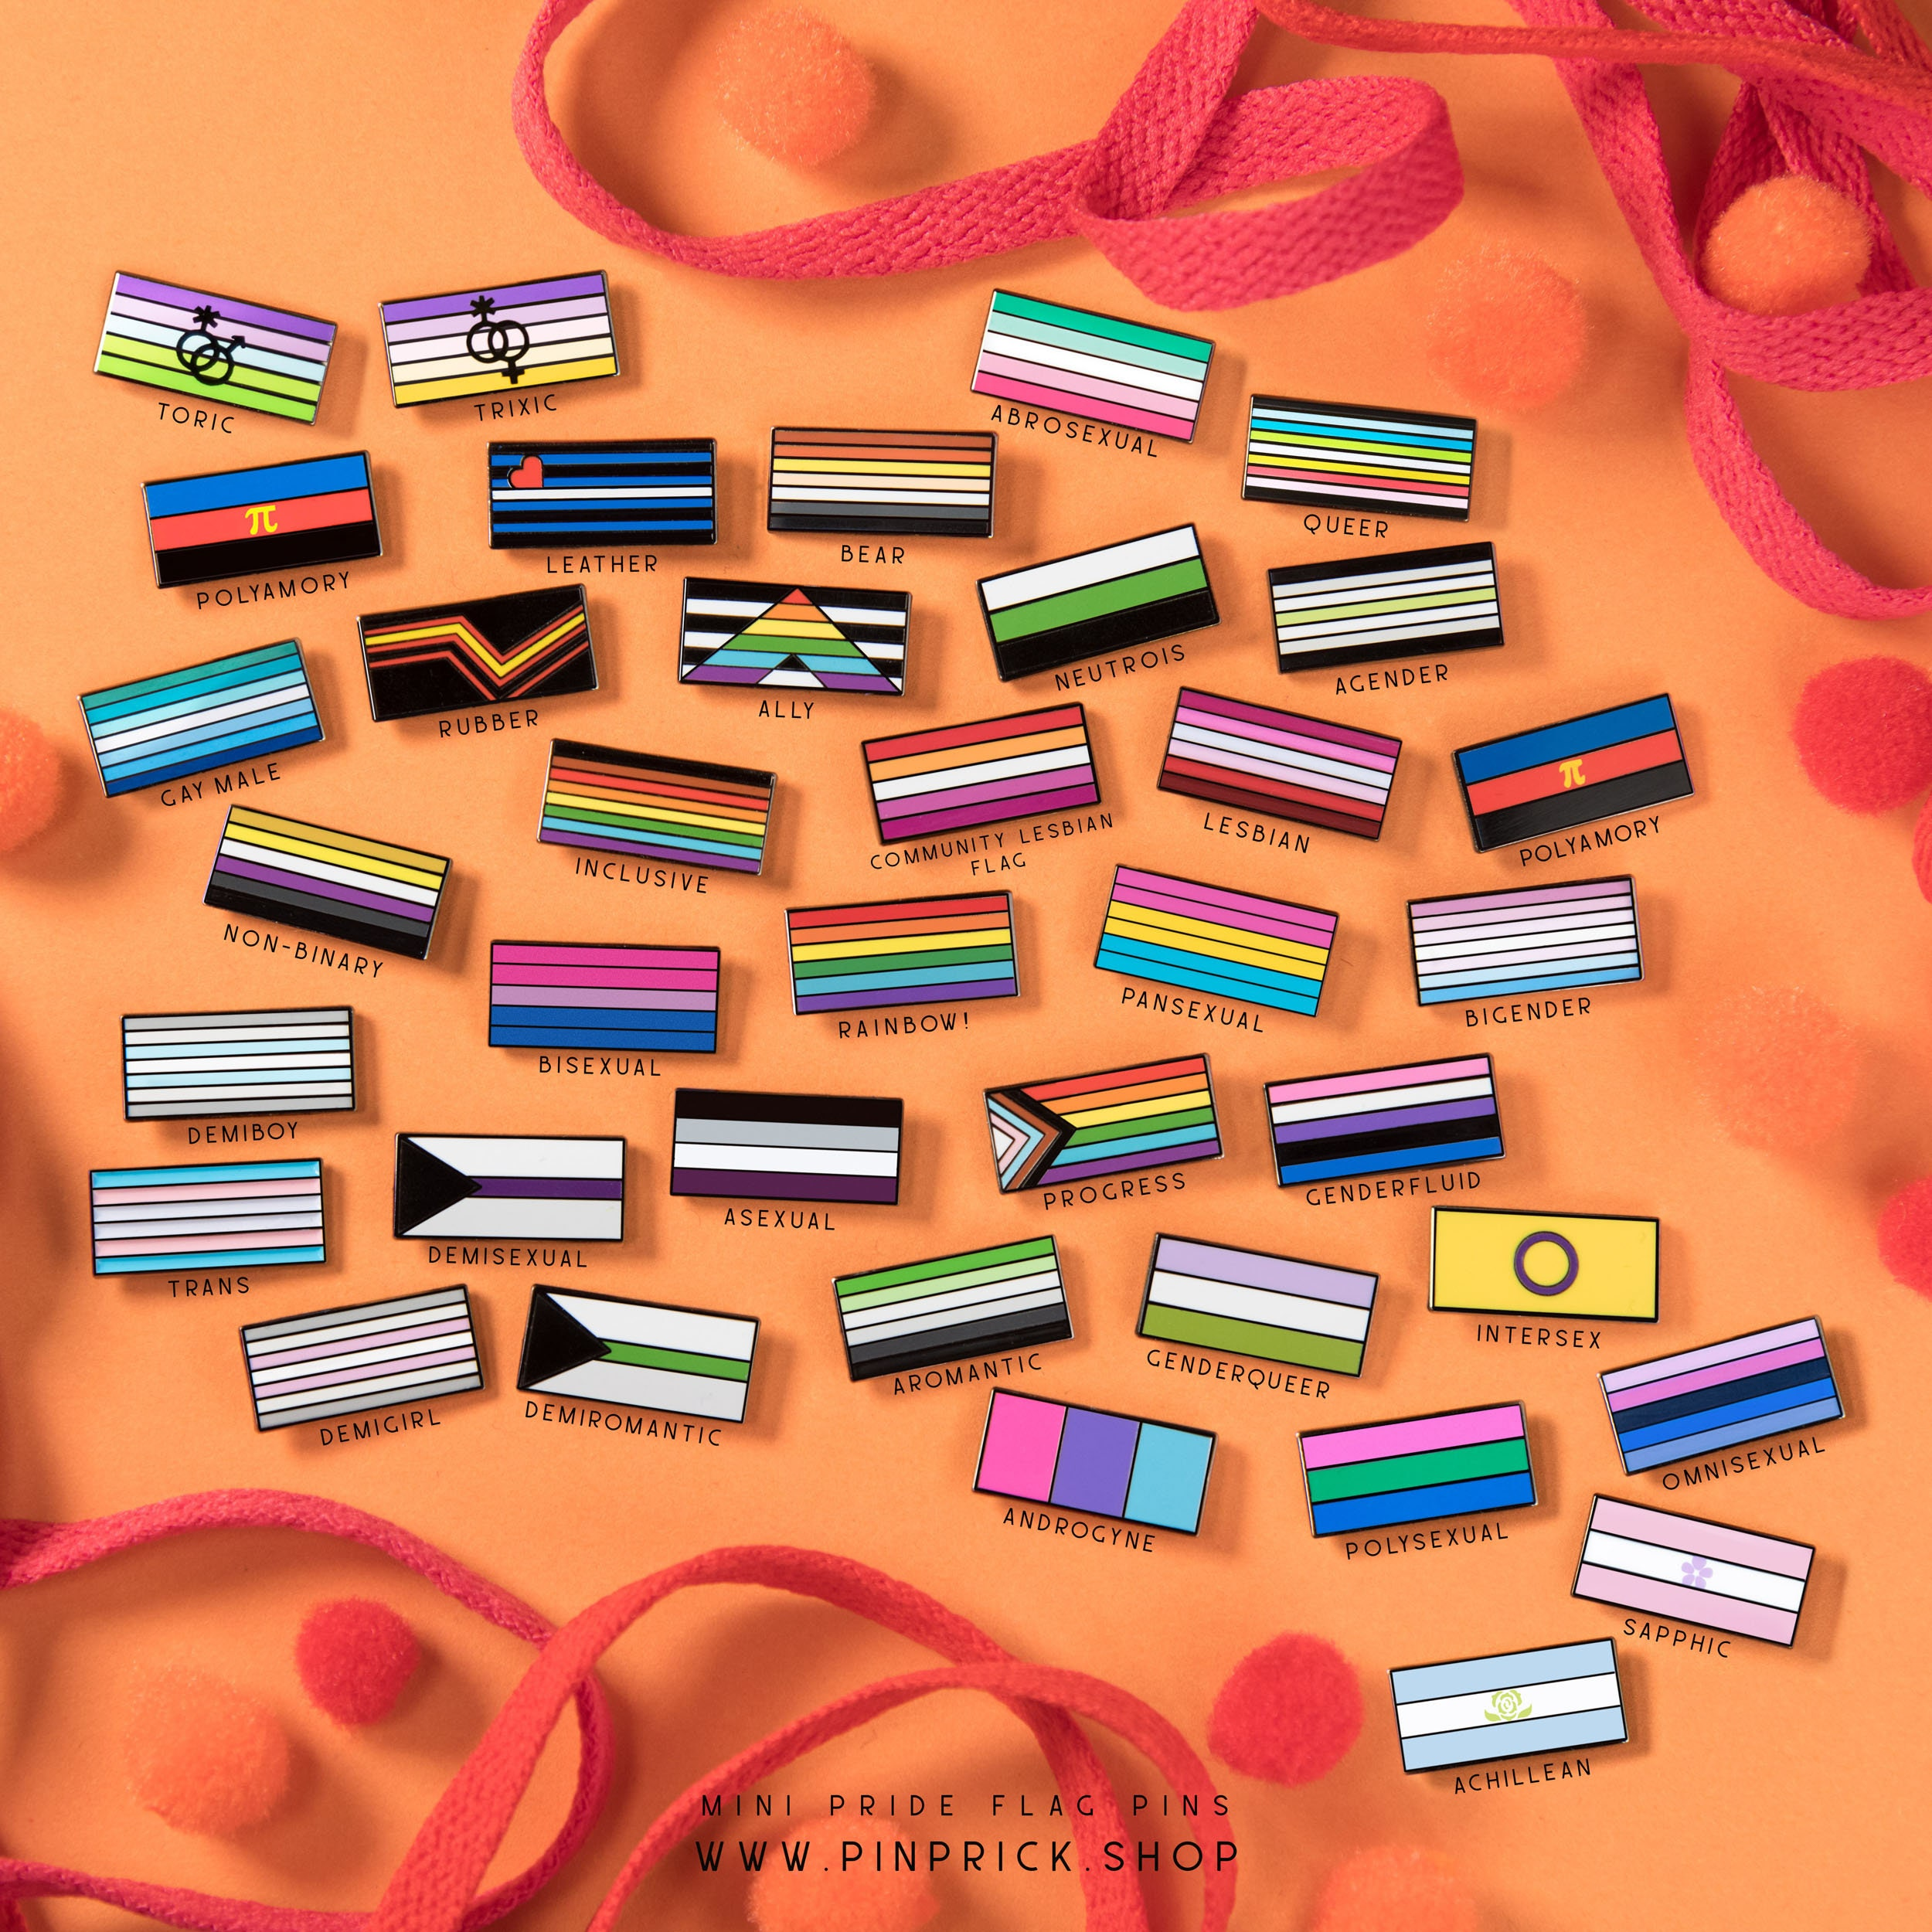 Genderqueer Pride Pin Genderqueer Flag Enamel Pin Green White Stripe Flag Gift Idea Queer LGBTQ Pride Flag Hard Enamel Pin Gender Pins